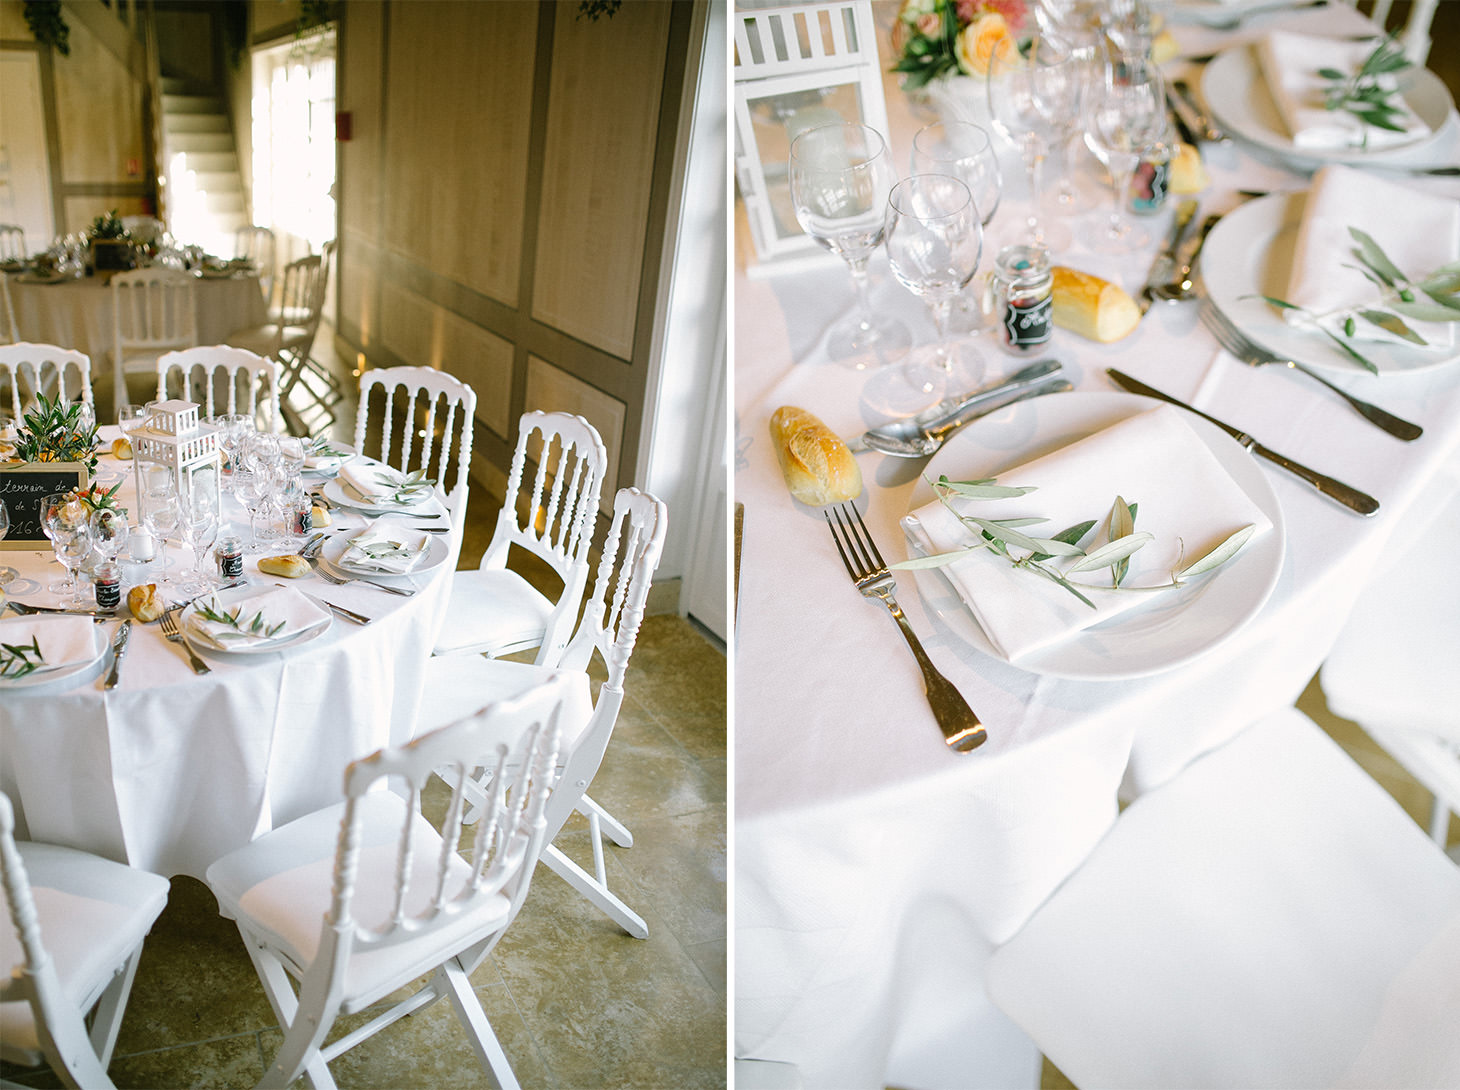 photographe-mariage-paris-montfort-l-amaury-075